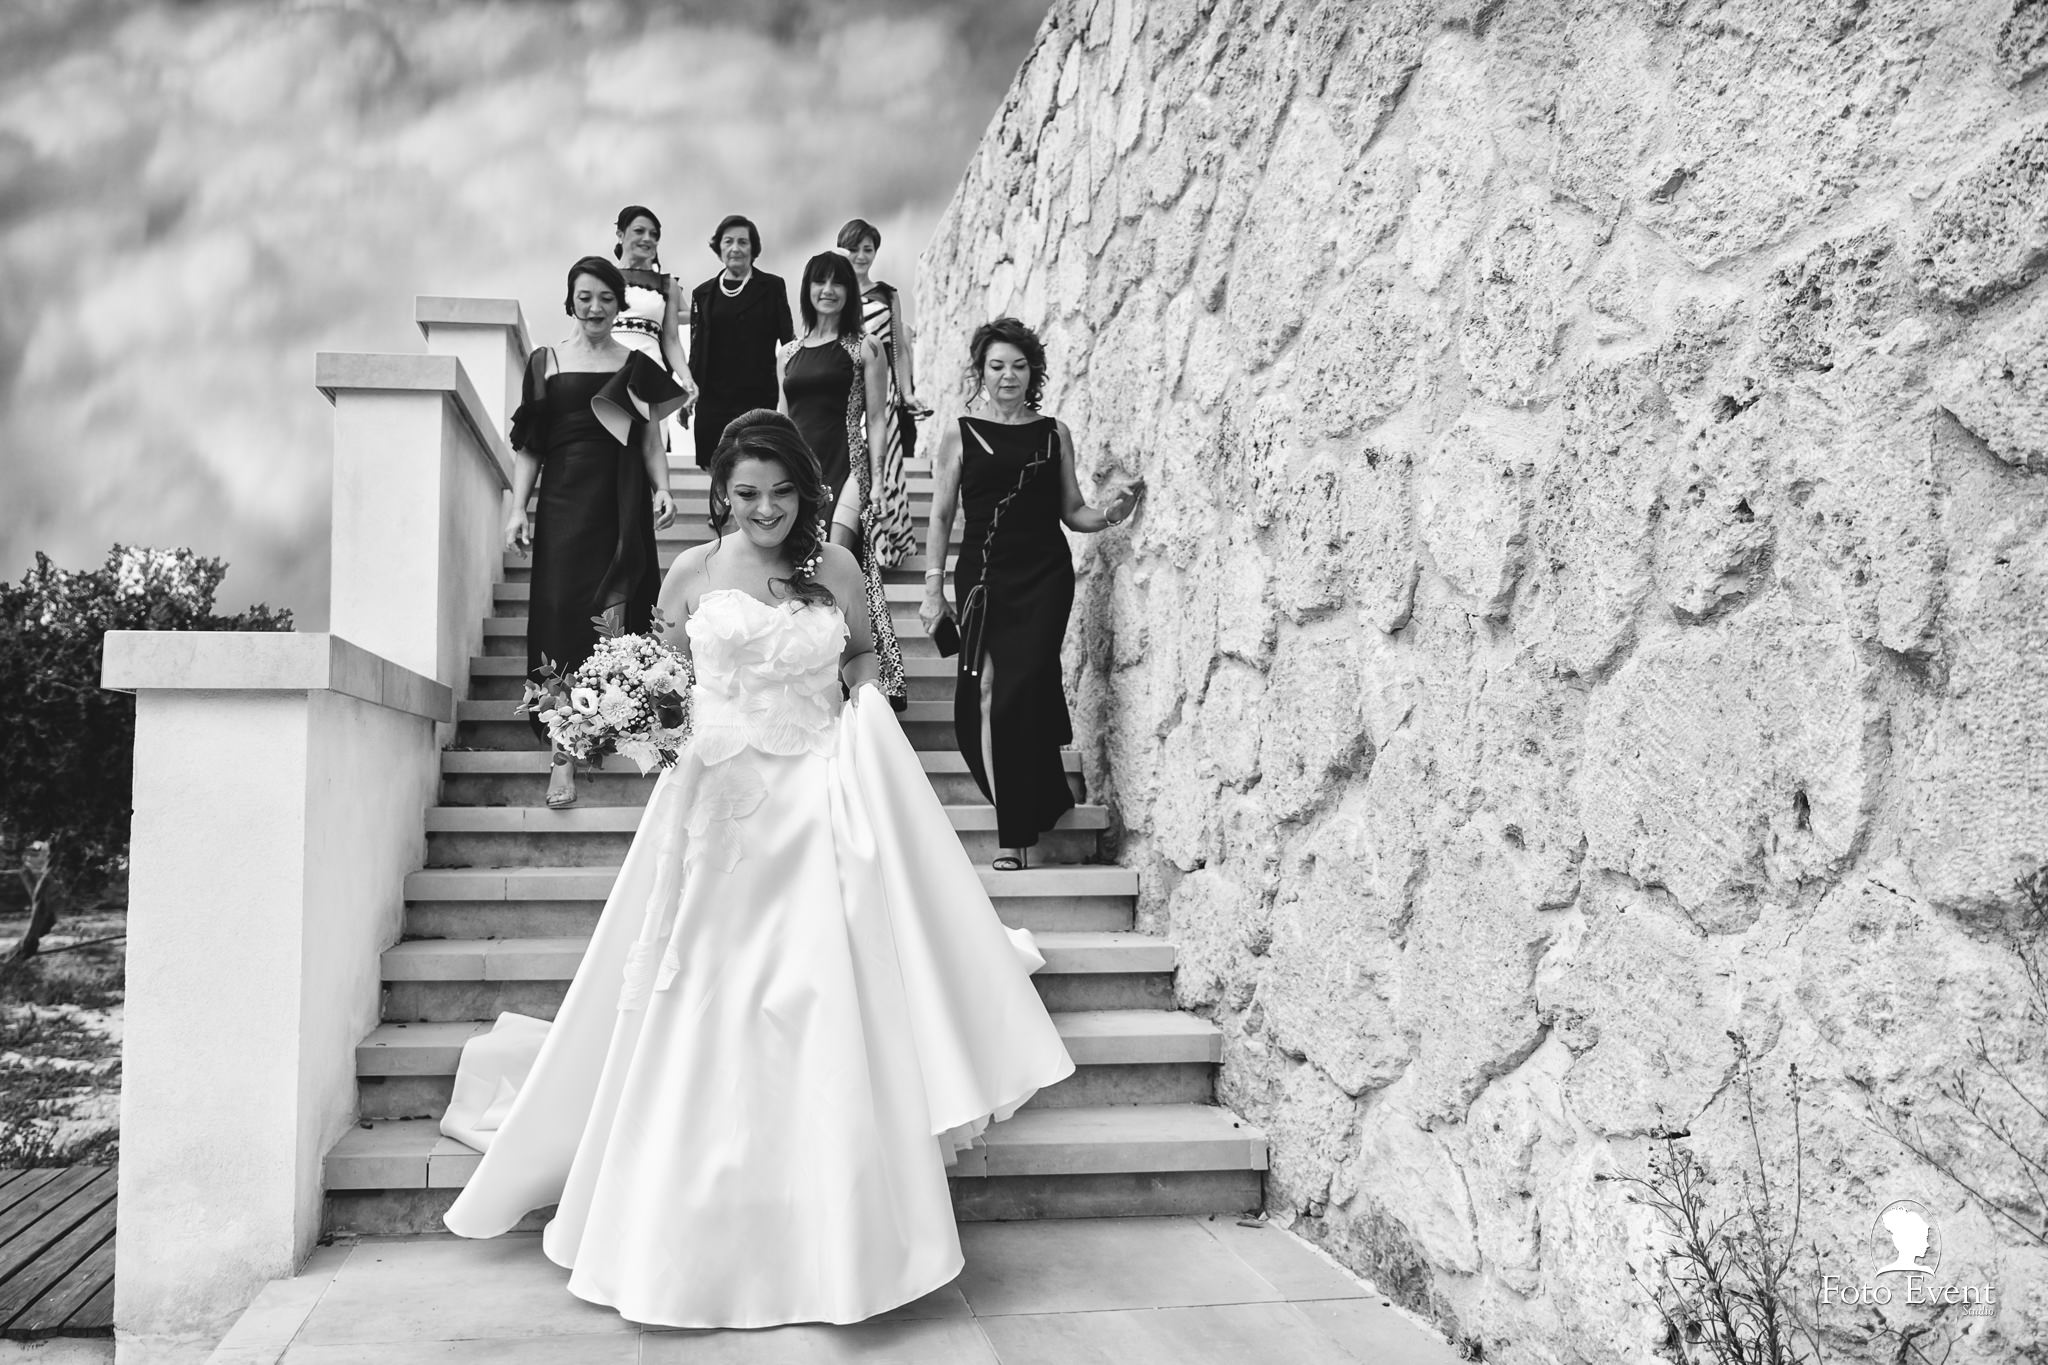 021-2020-10-15-Matrimonio-Noemi-e-Salvatore-Paterno-5DE-872-Edit